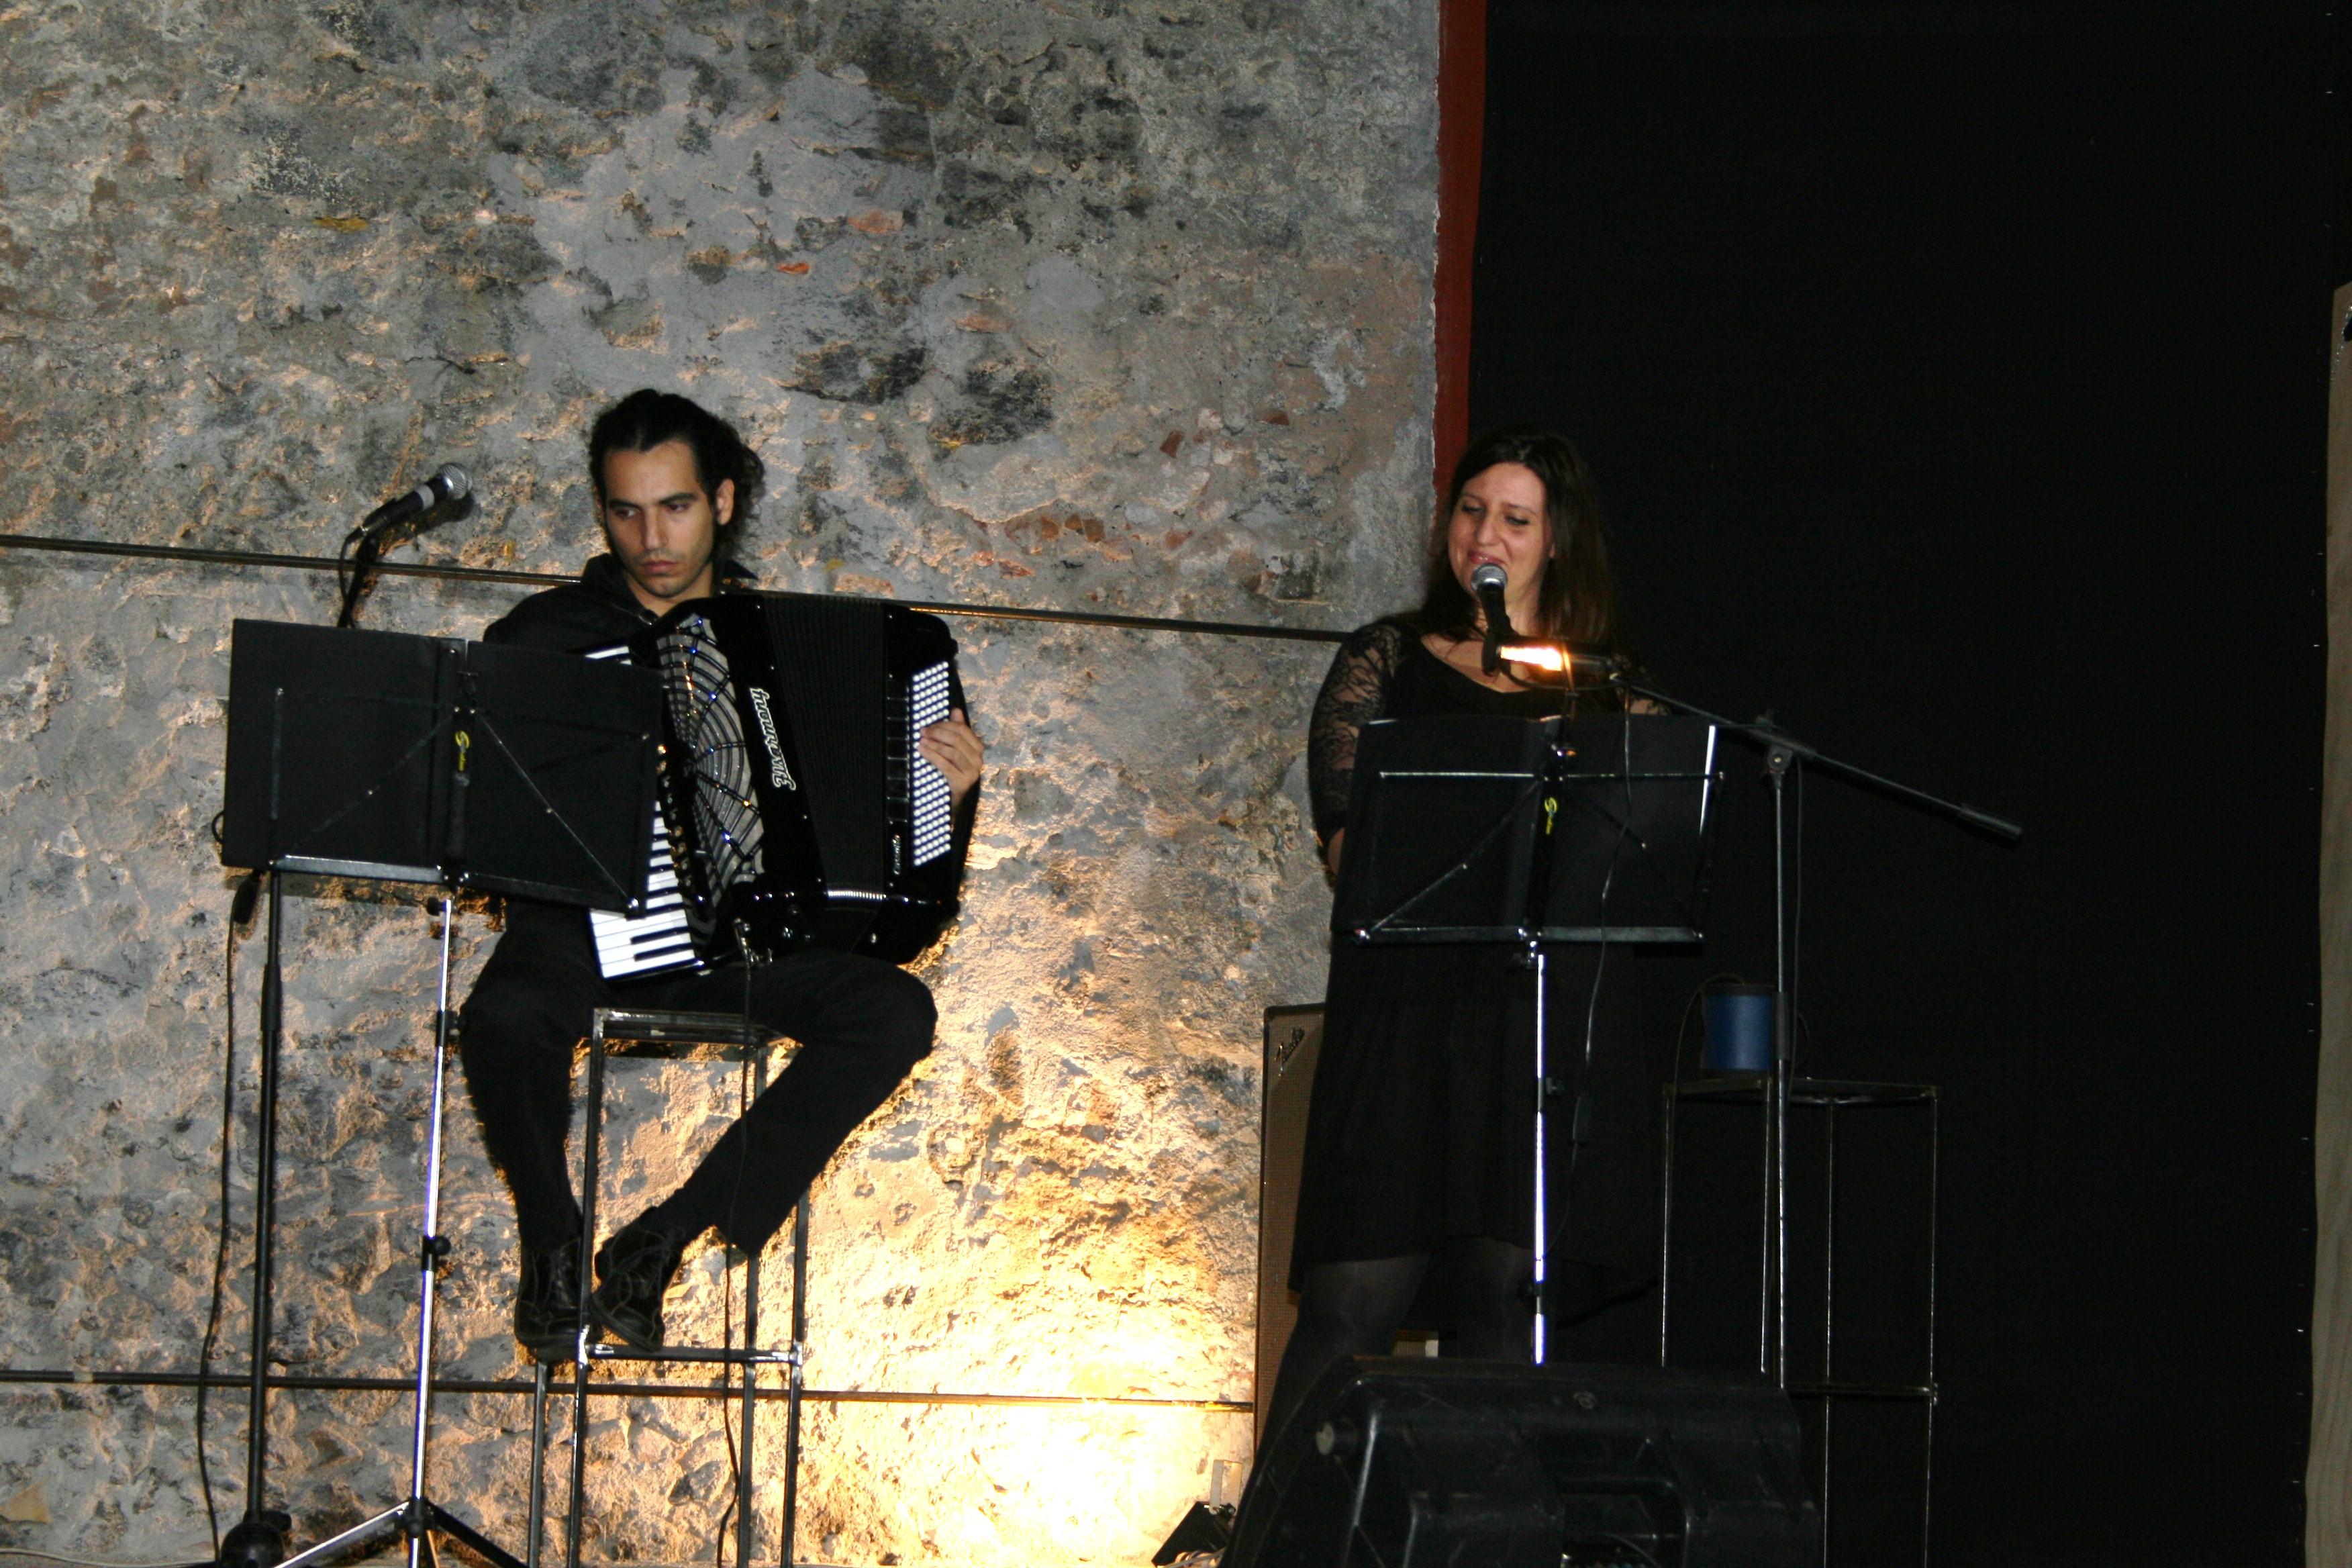 Salverico Cutuli e Anna Tinebra